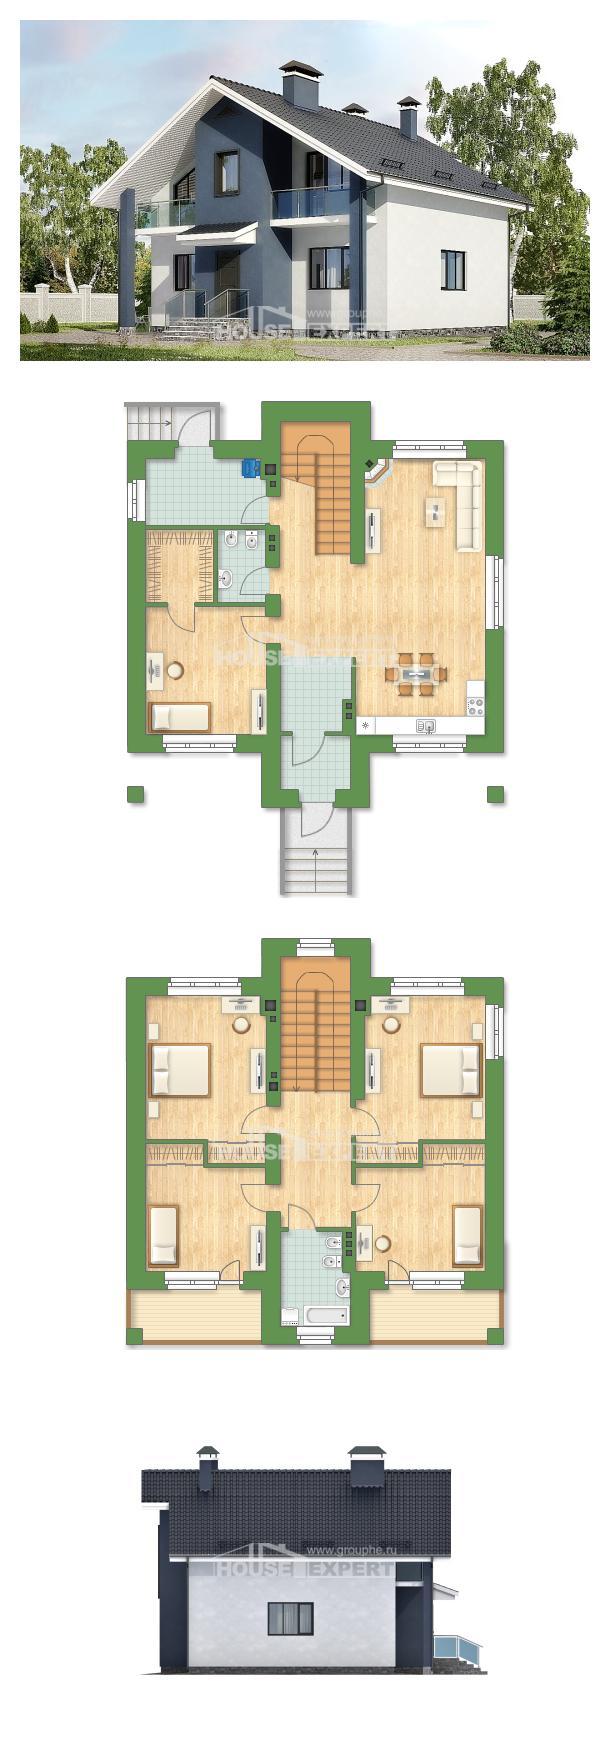 Projekt domu 150-005-R | House Expert